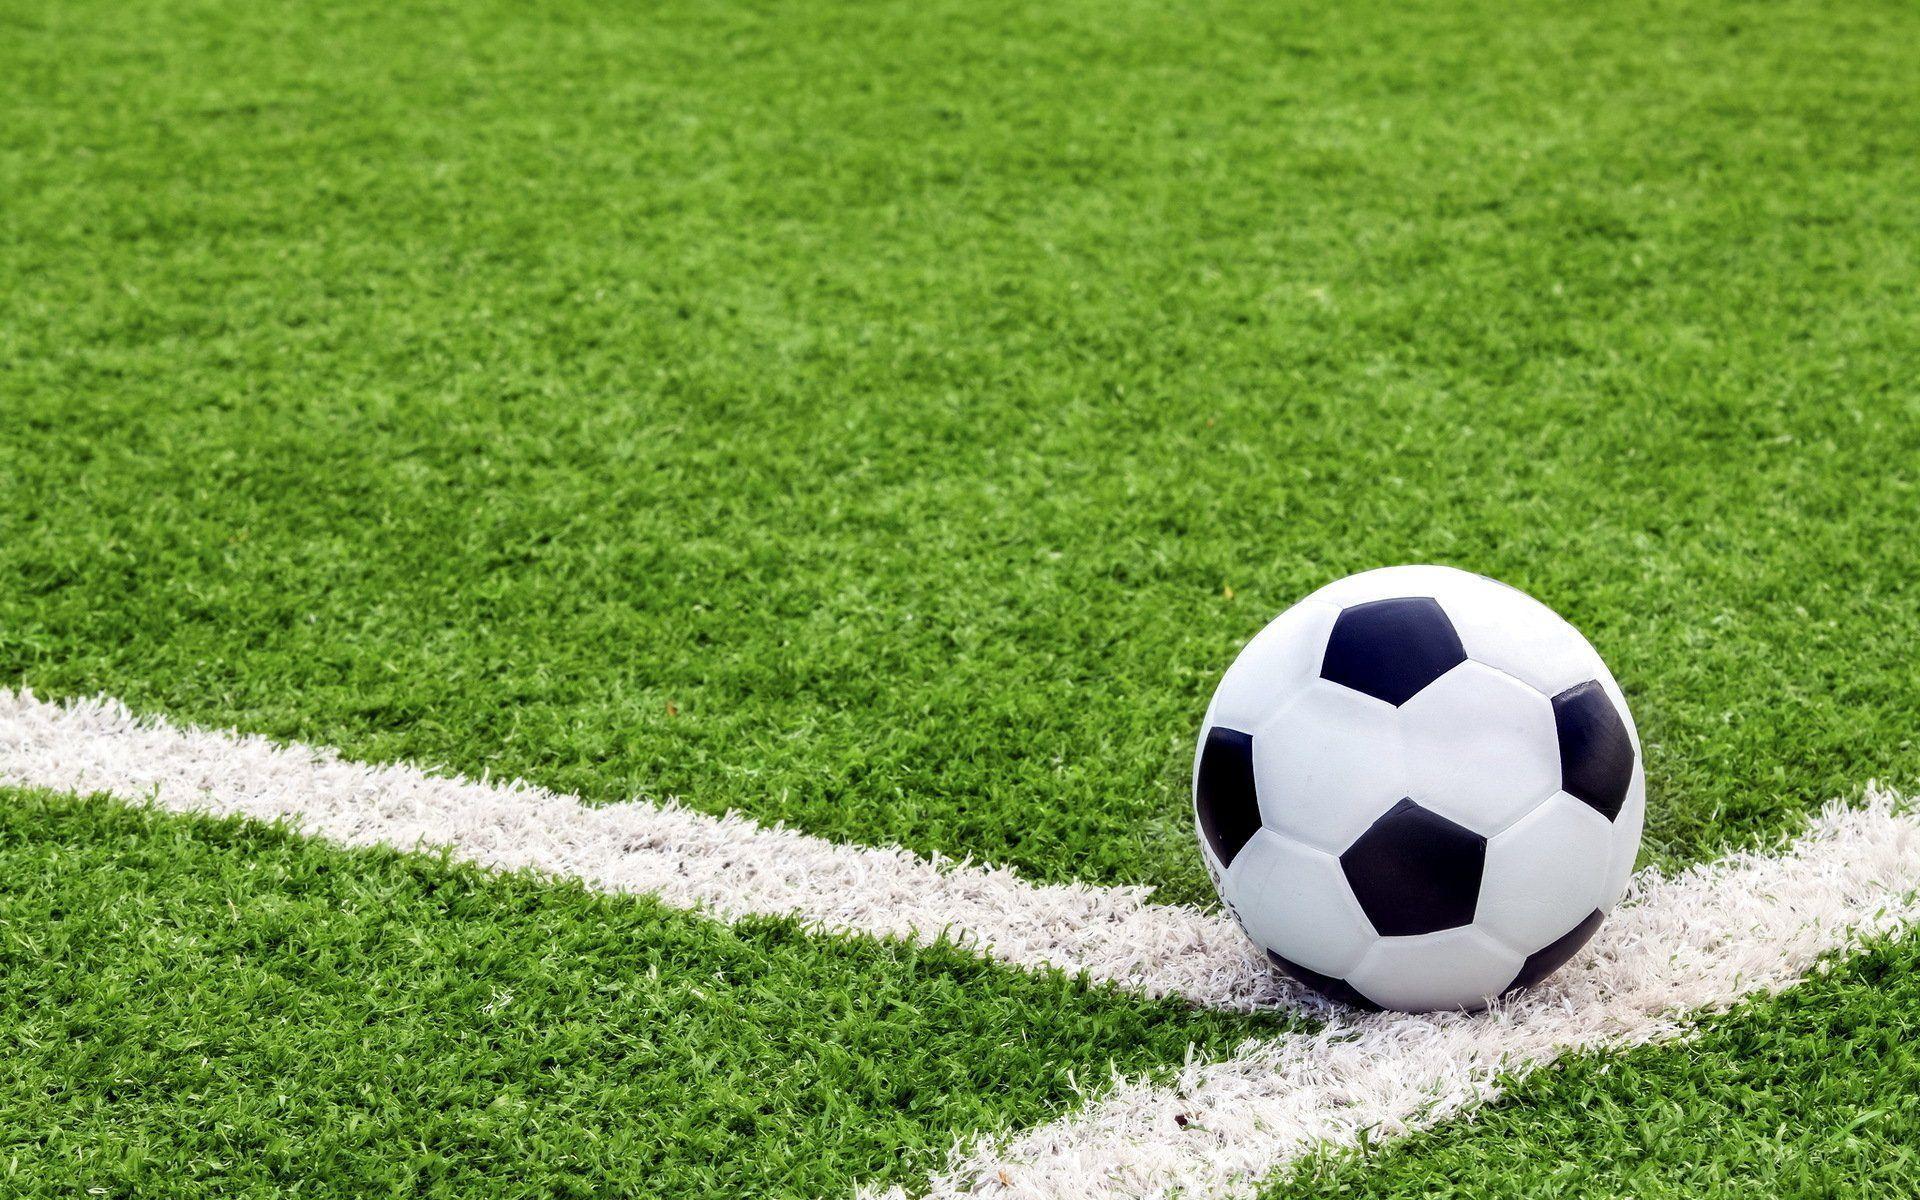 Cool Green Soccer Ball Wallpapers: Soccer Balls Wallpapers